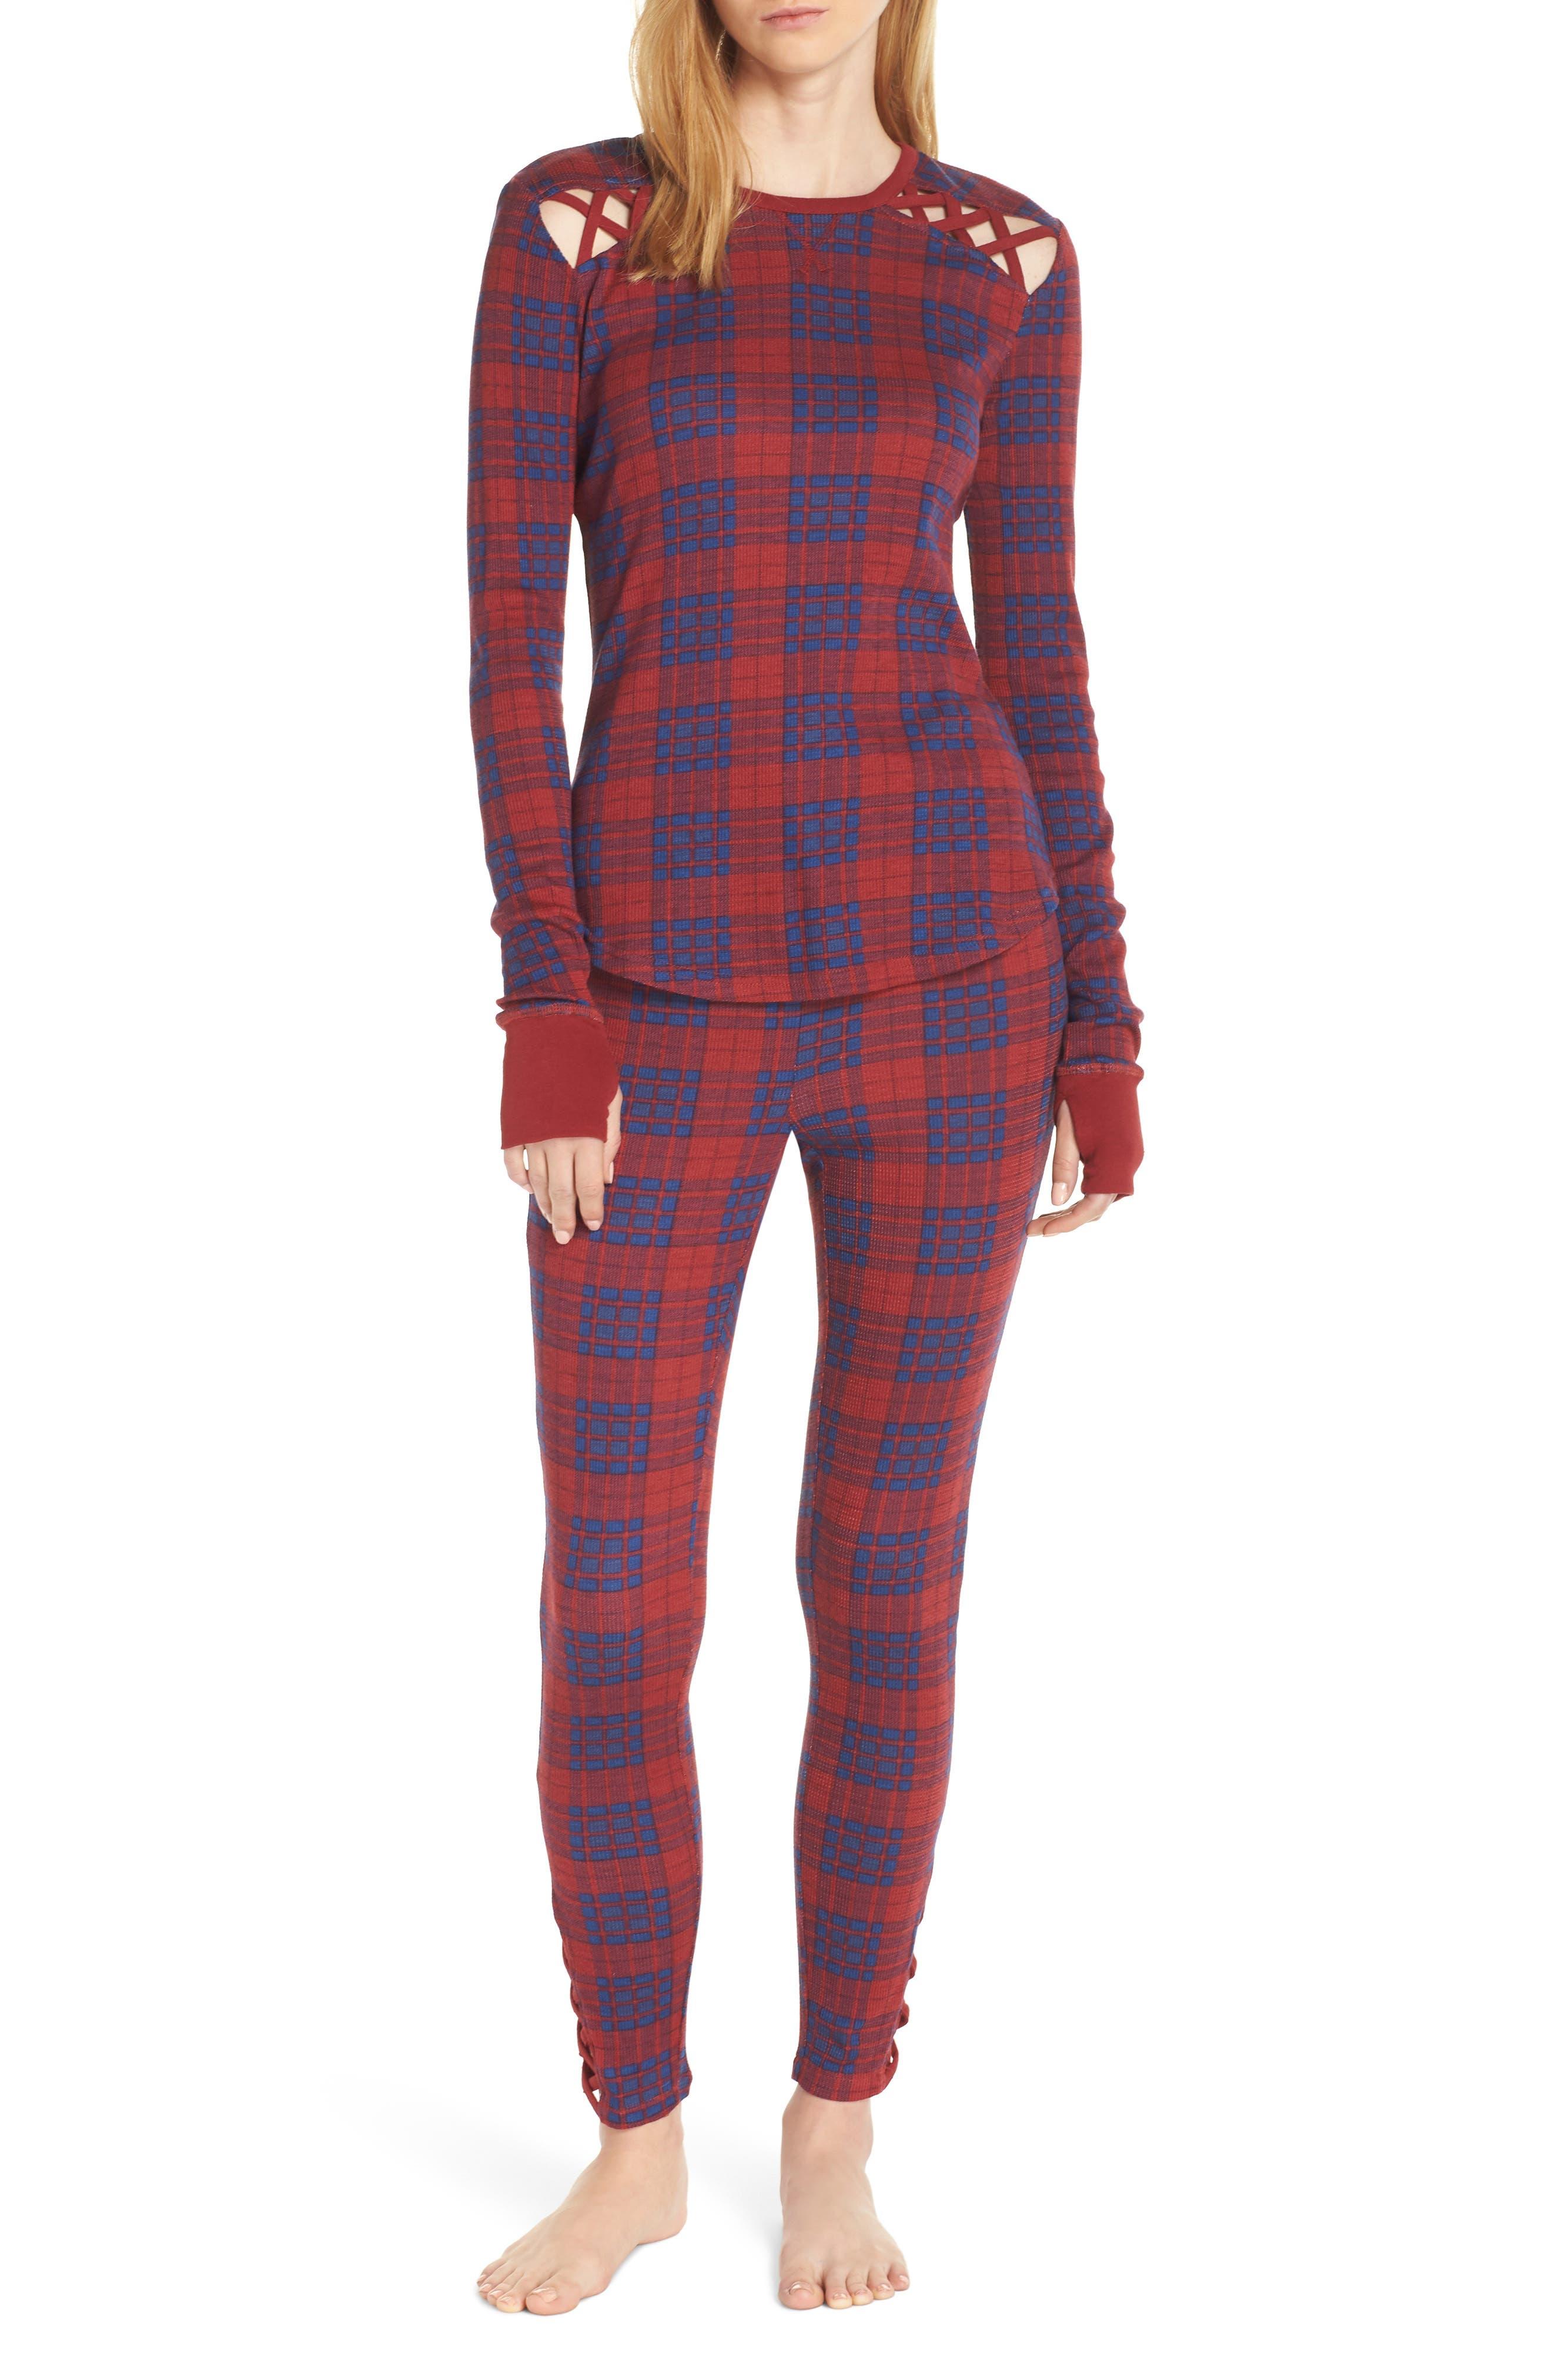 Retrospective Co. Thermal Pajamas, Burgundy